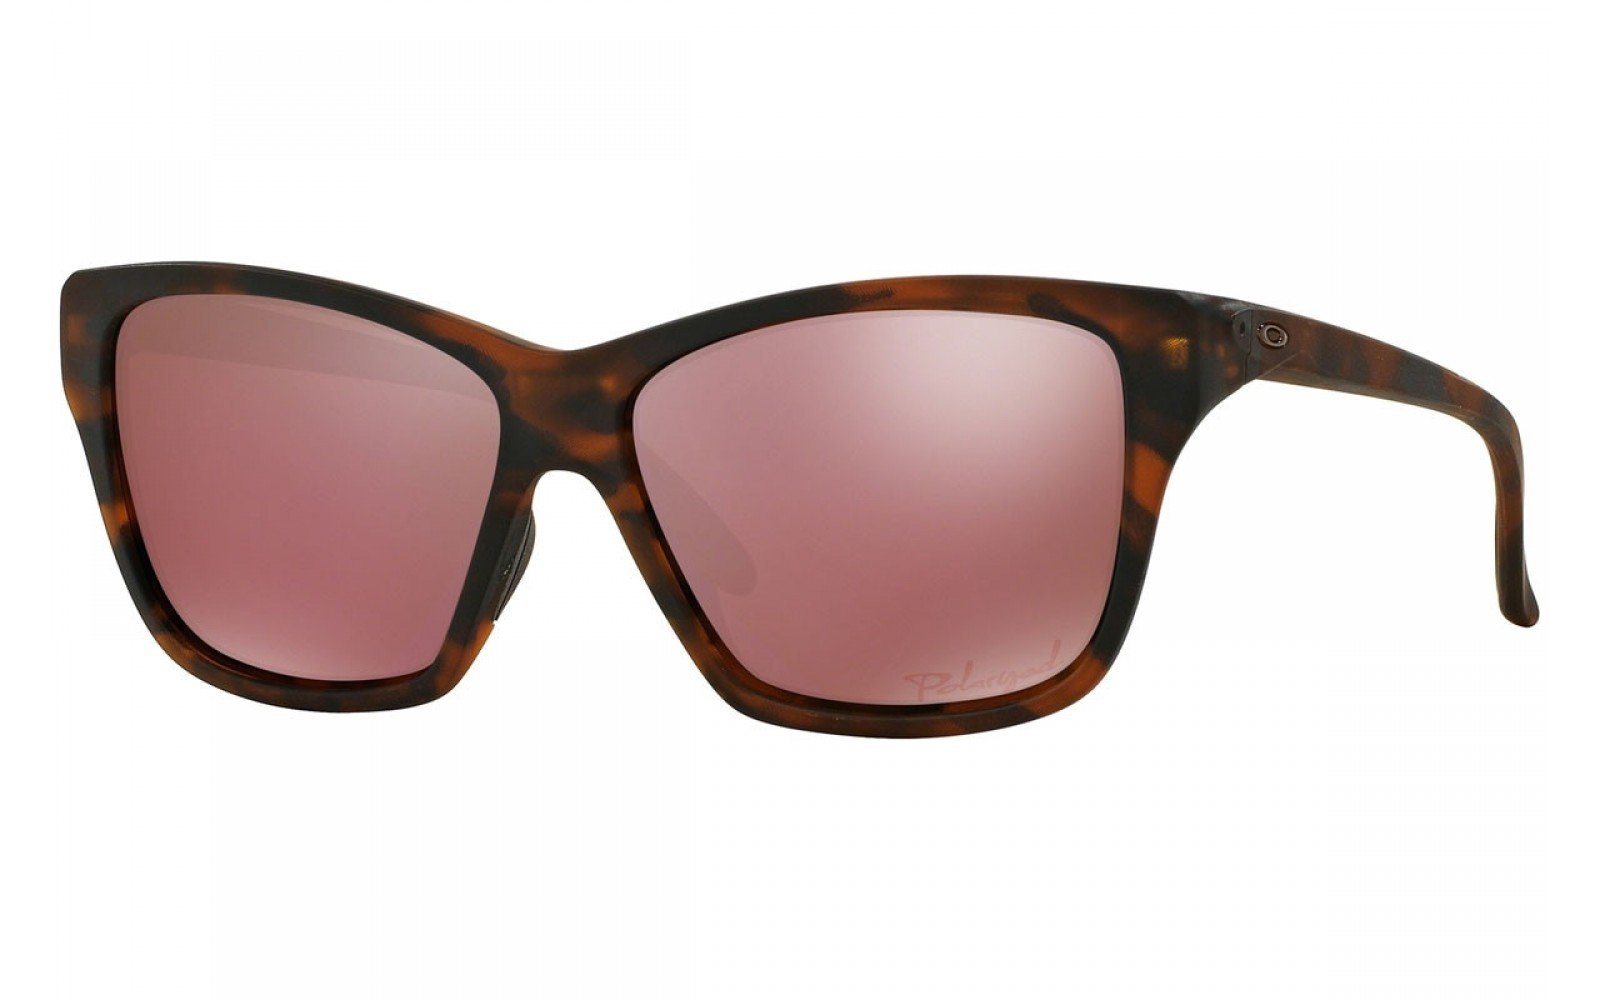 Oakley Hold On - Matte Tortoise / VR28 Black Iridium Polarized - OO9298-07 Zonnebril